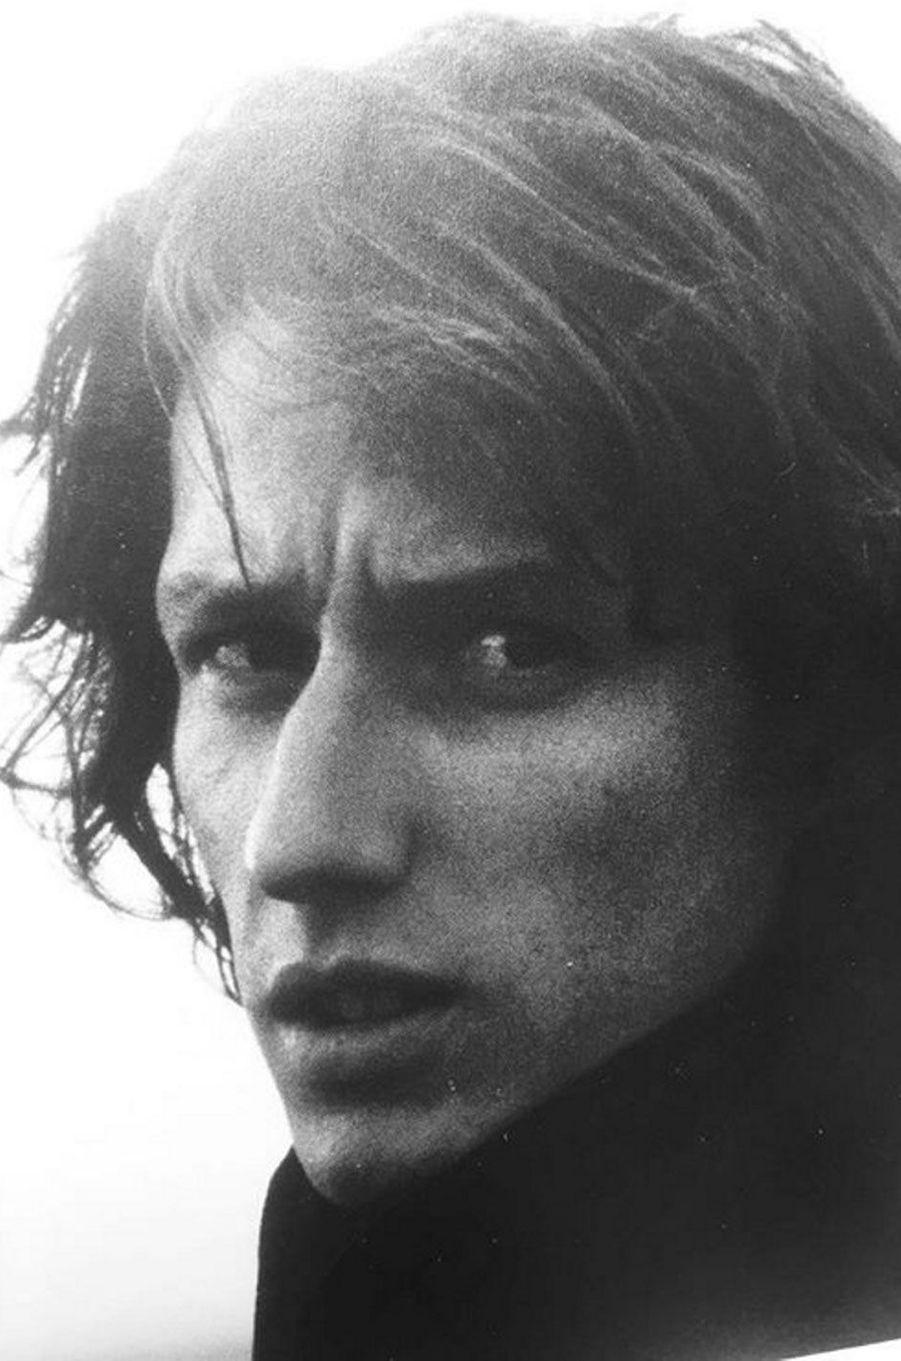 Portrait du frère de Carla Bruni, Virginio